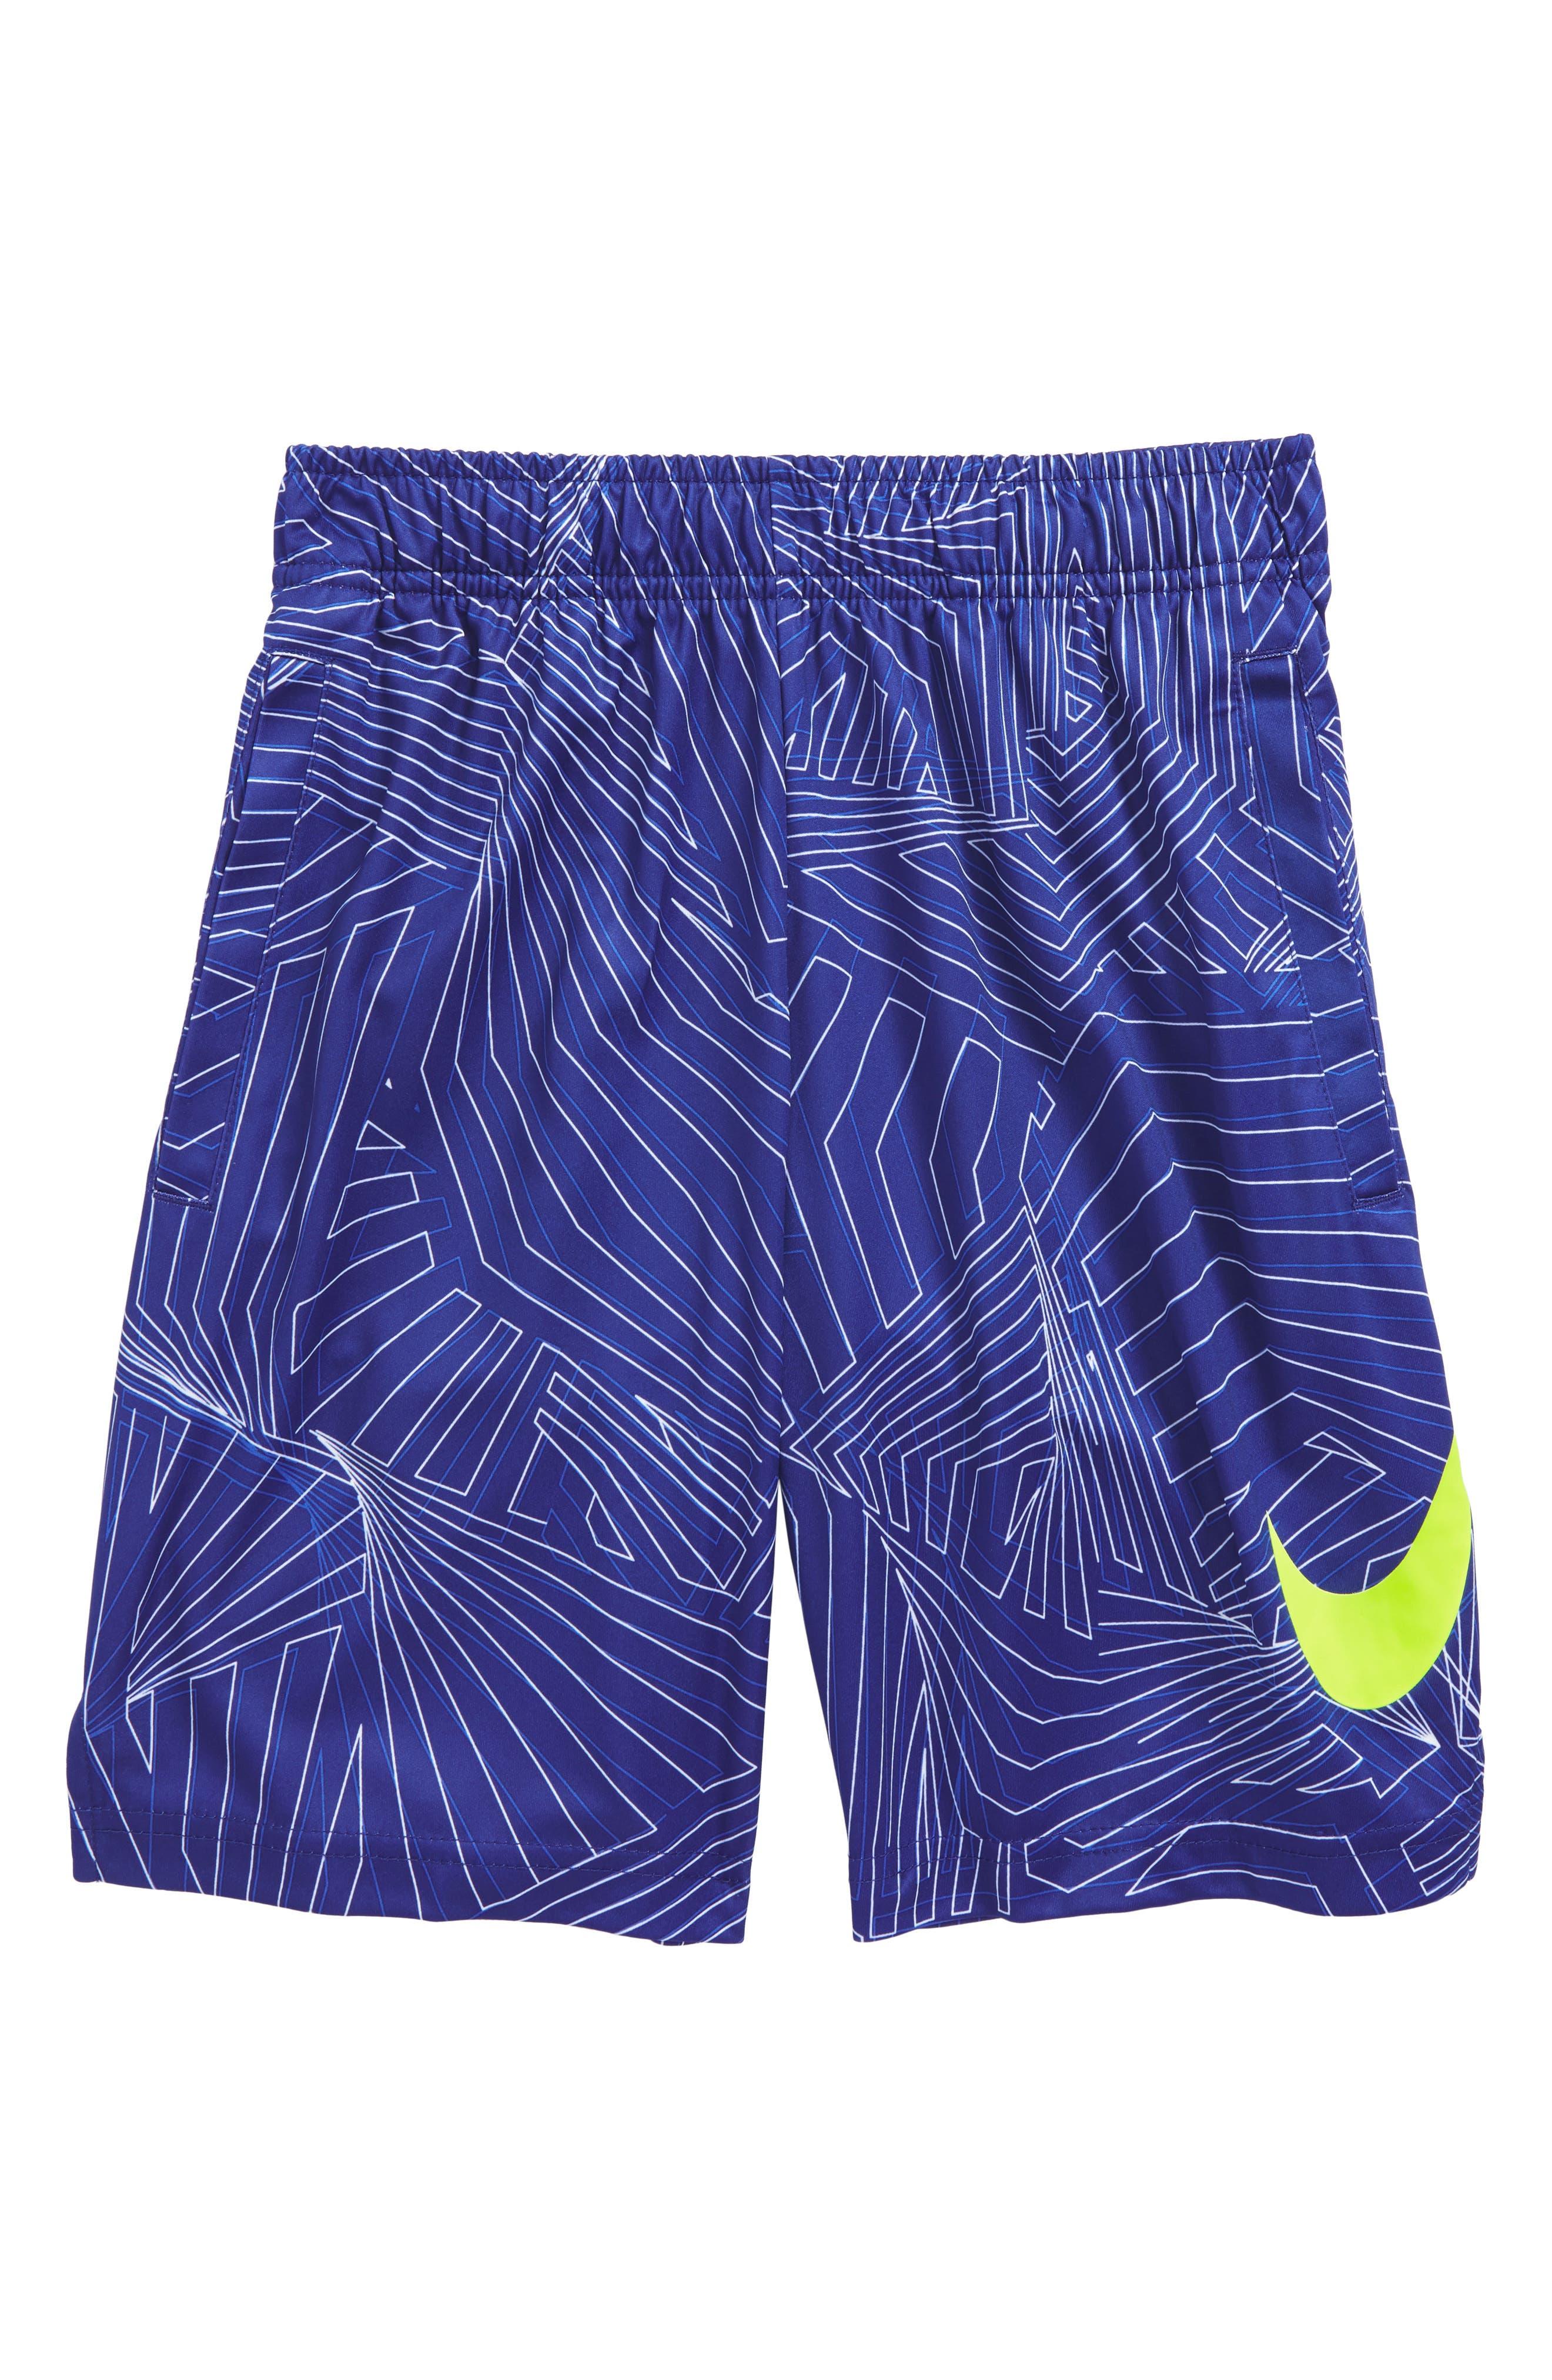 Dry Training Shorts,                             Main thumbnail 2, color,